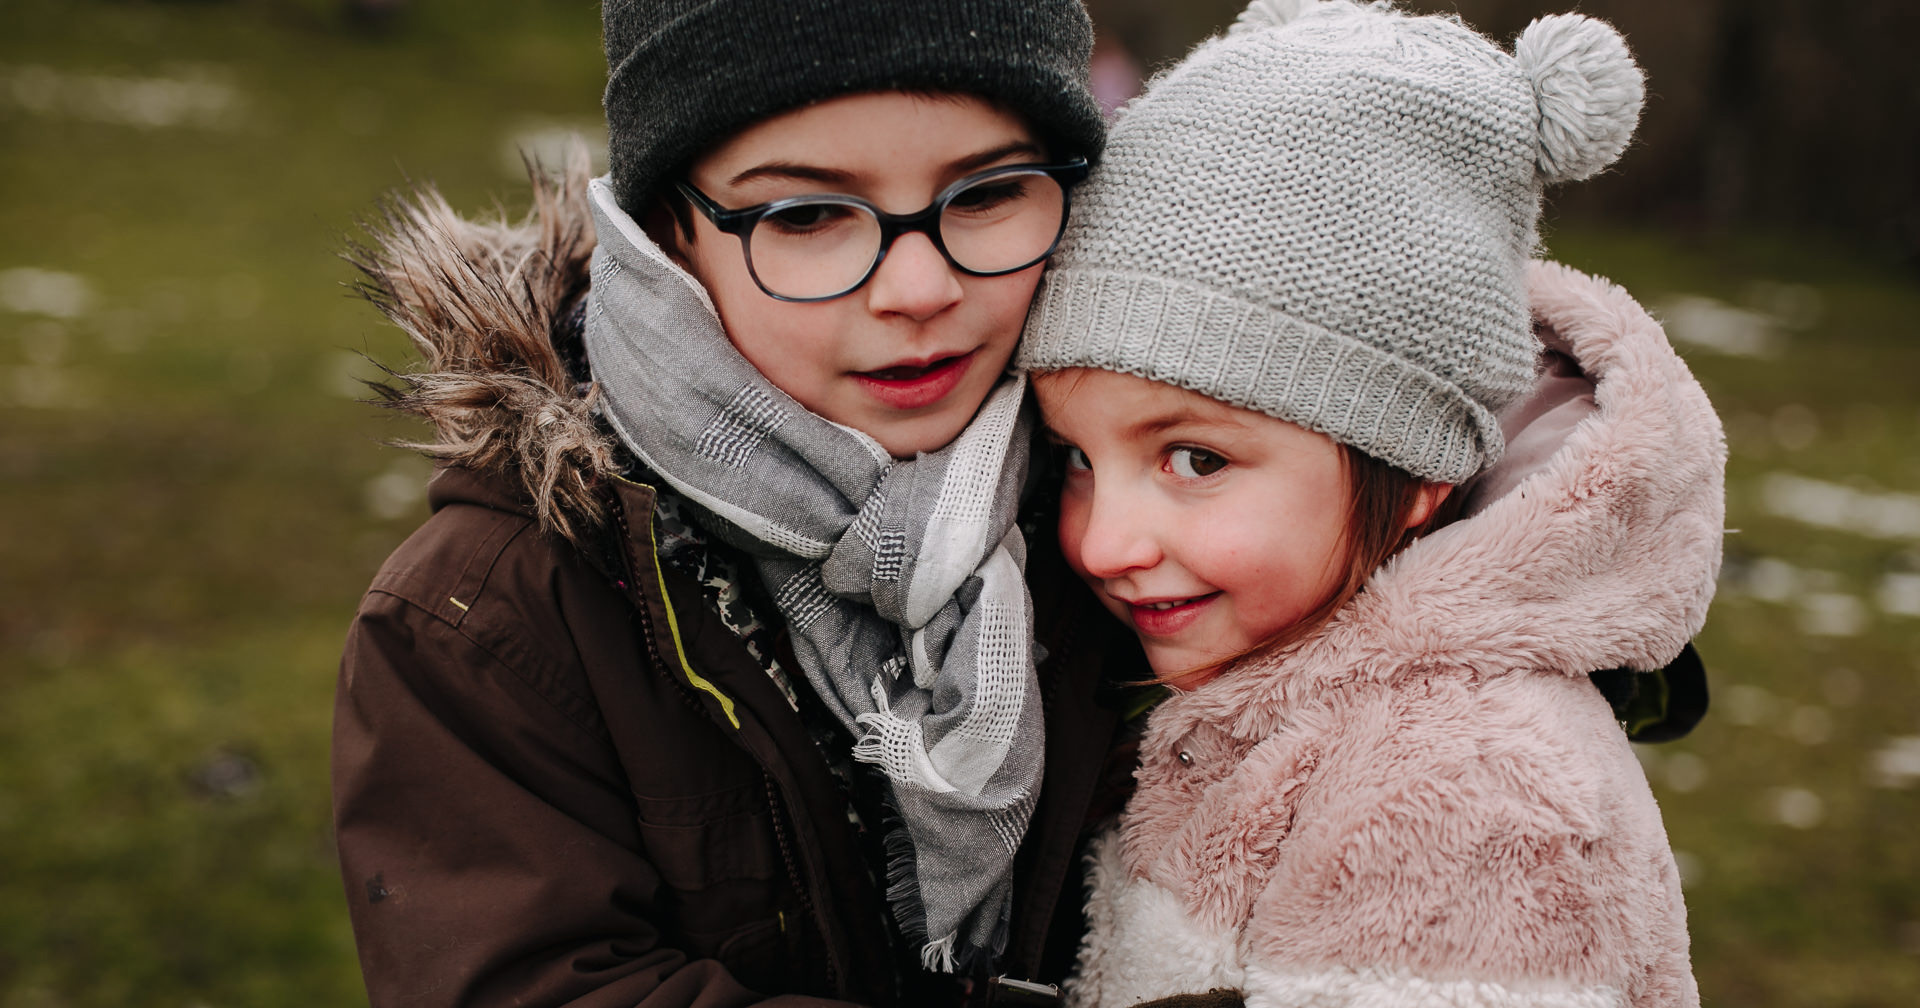 XIANA & DANI | FOTOS DE FAMILIA EN LA NIEVE